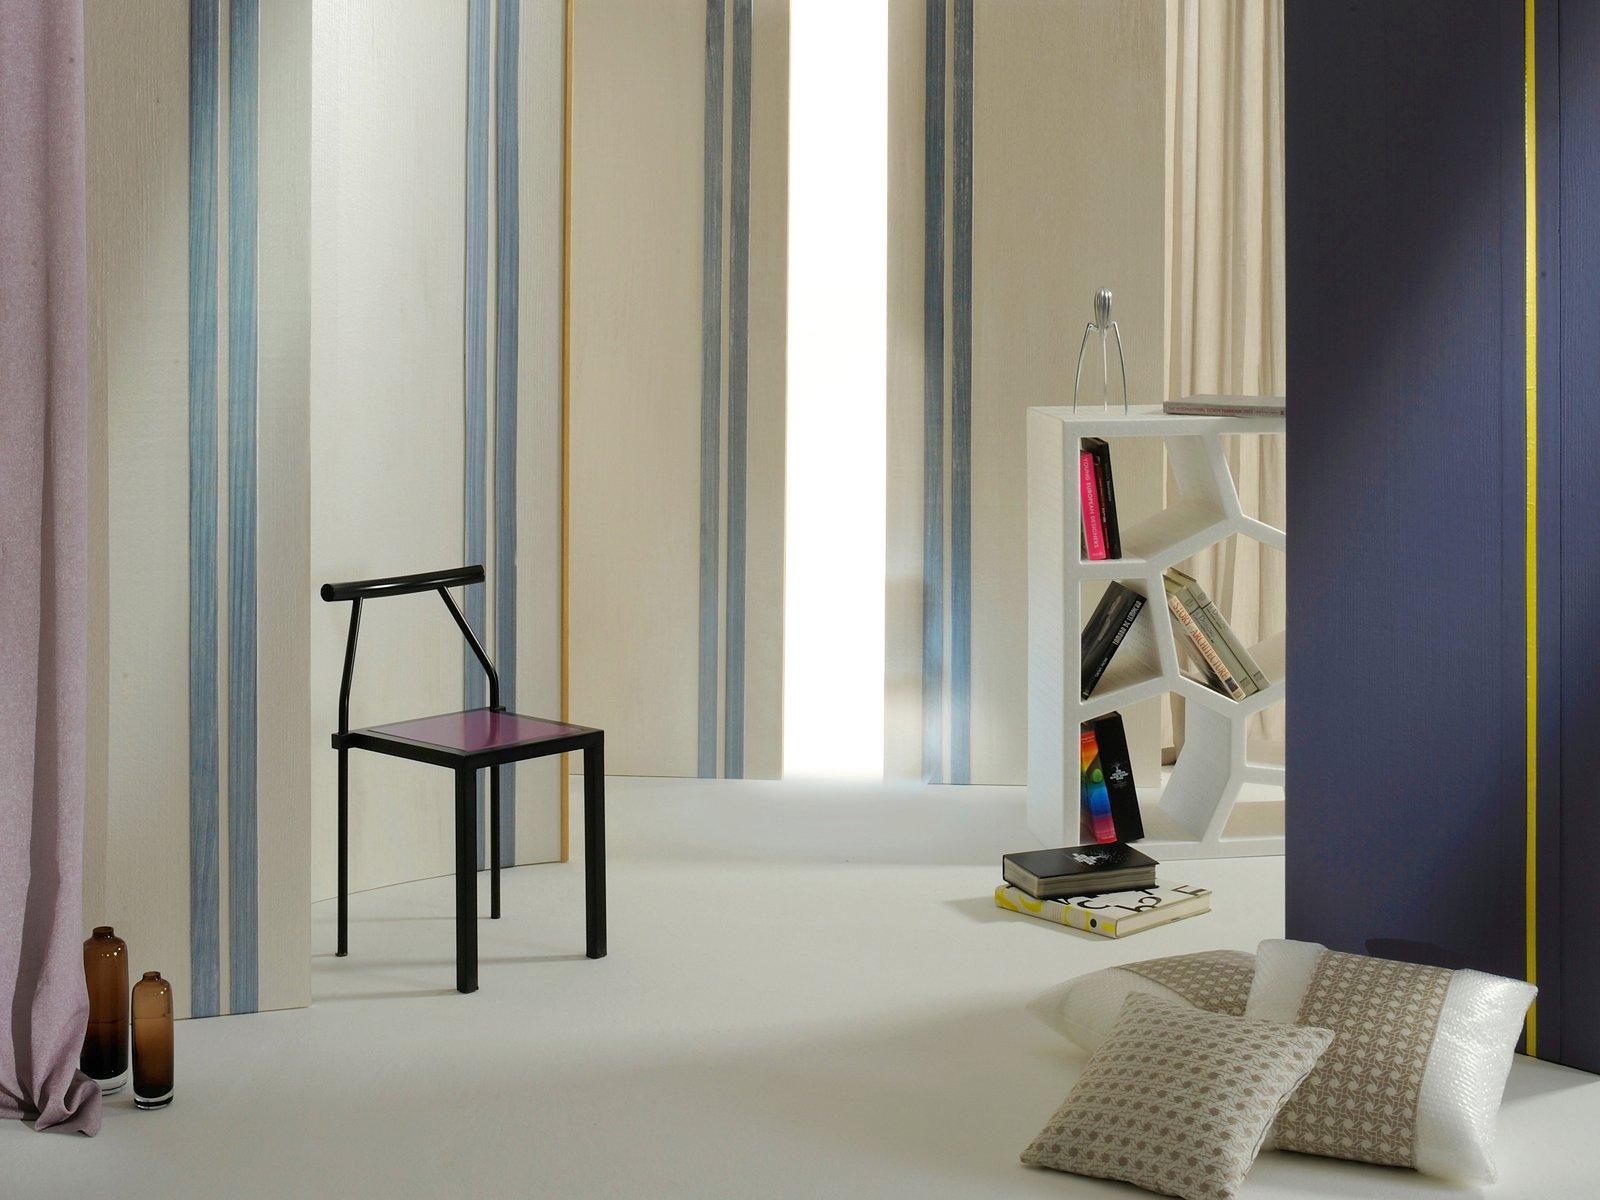 Carta Da Parati A Righe Beige : La carta da parati per trasformare le pareti di casa cose di casa